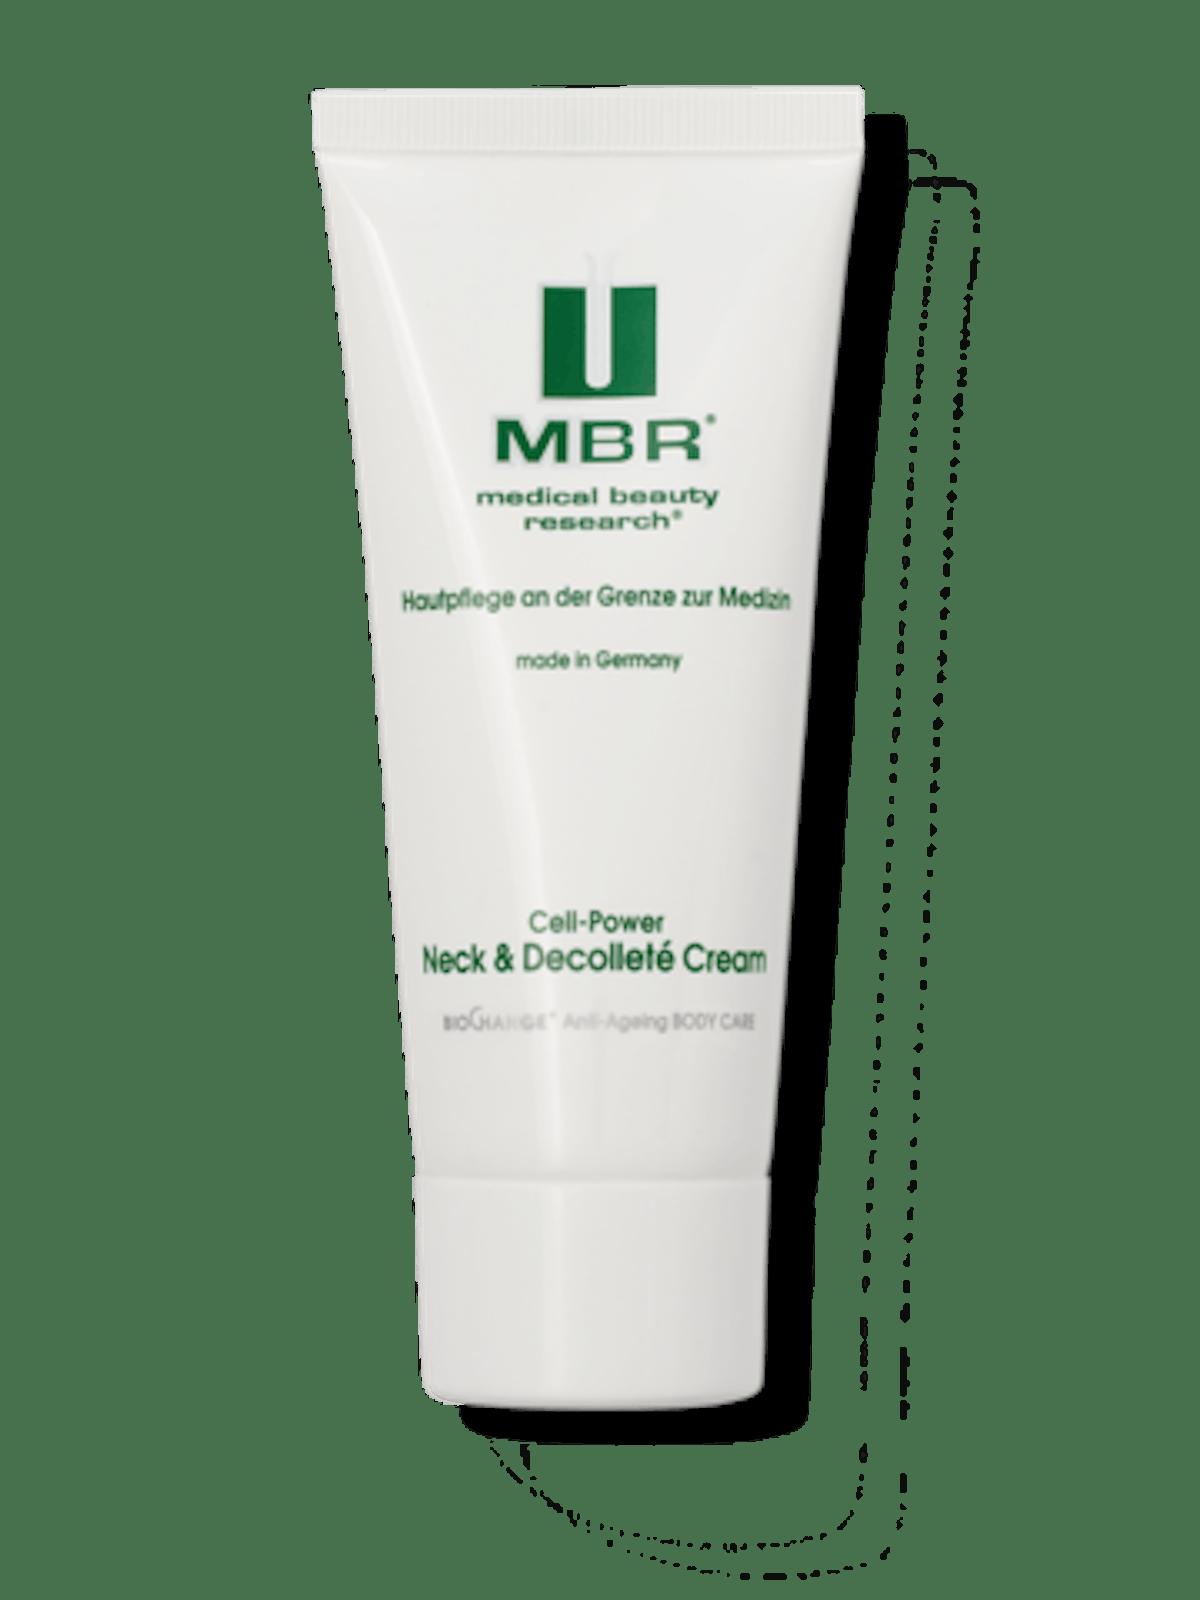 Cell-Power Neck & Decollete Cream